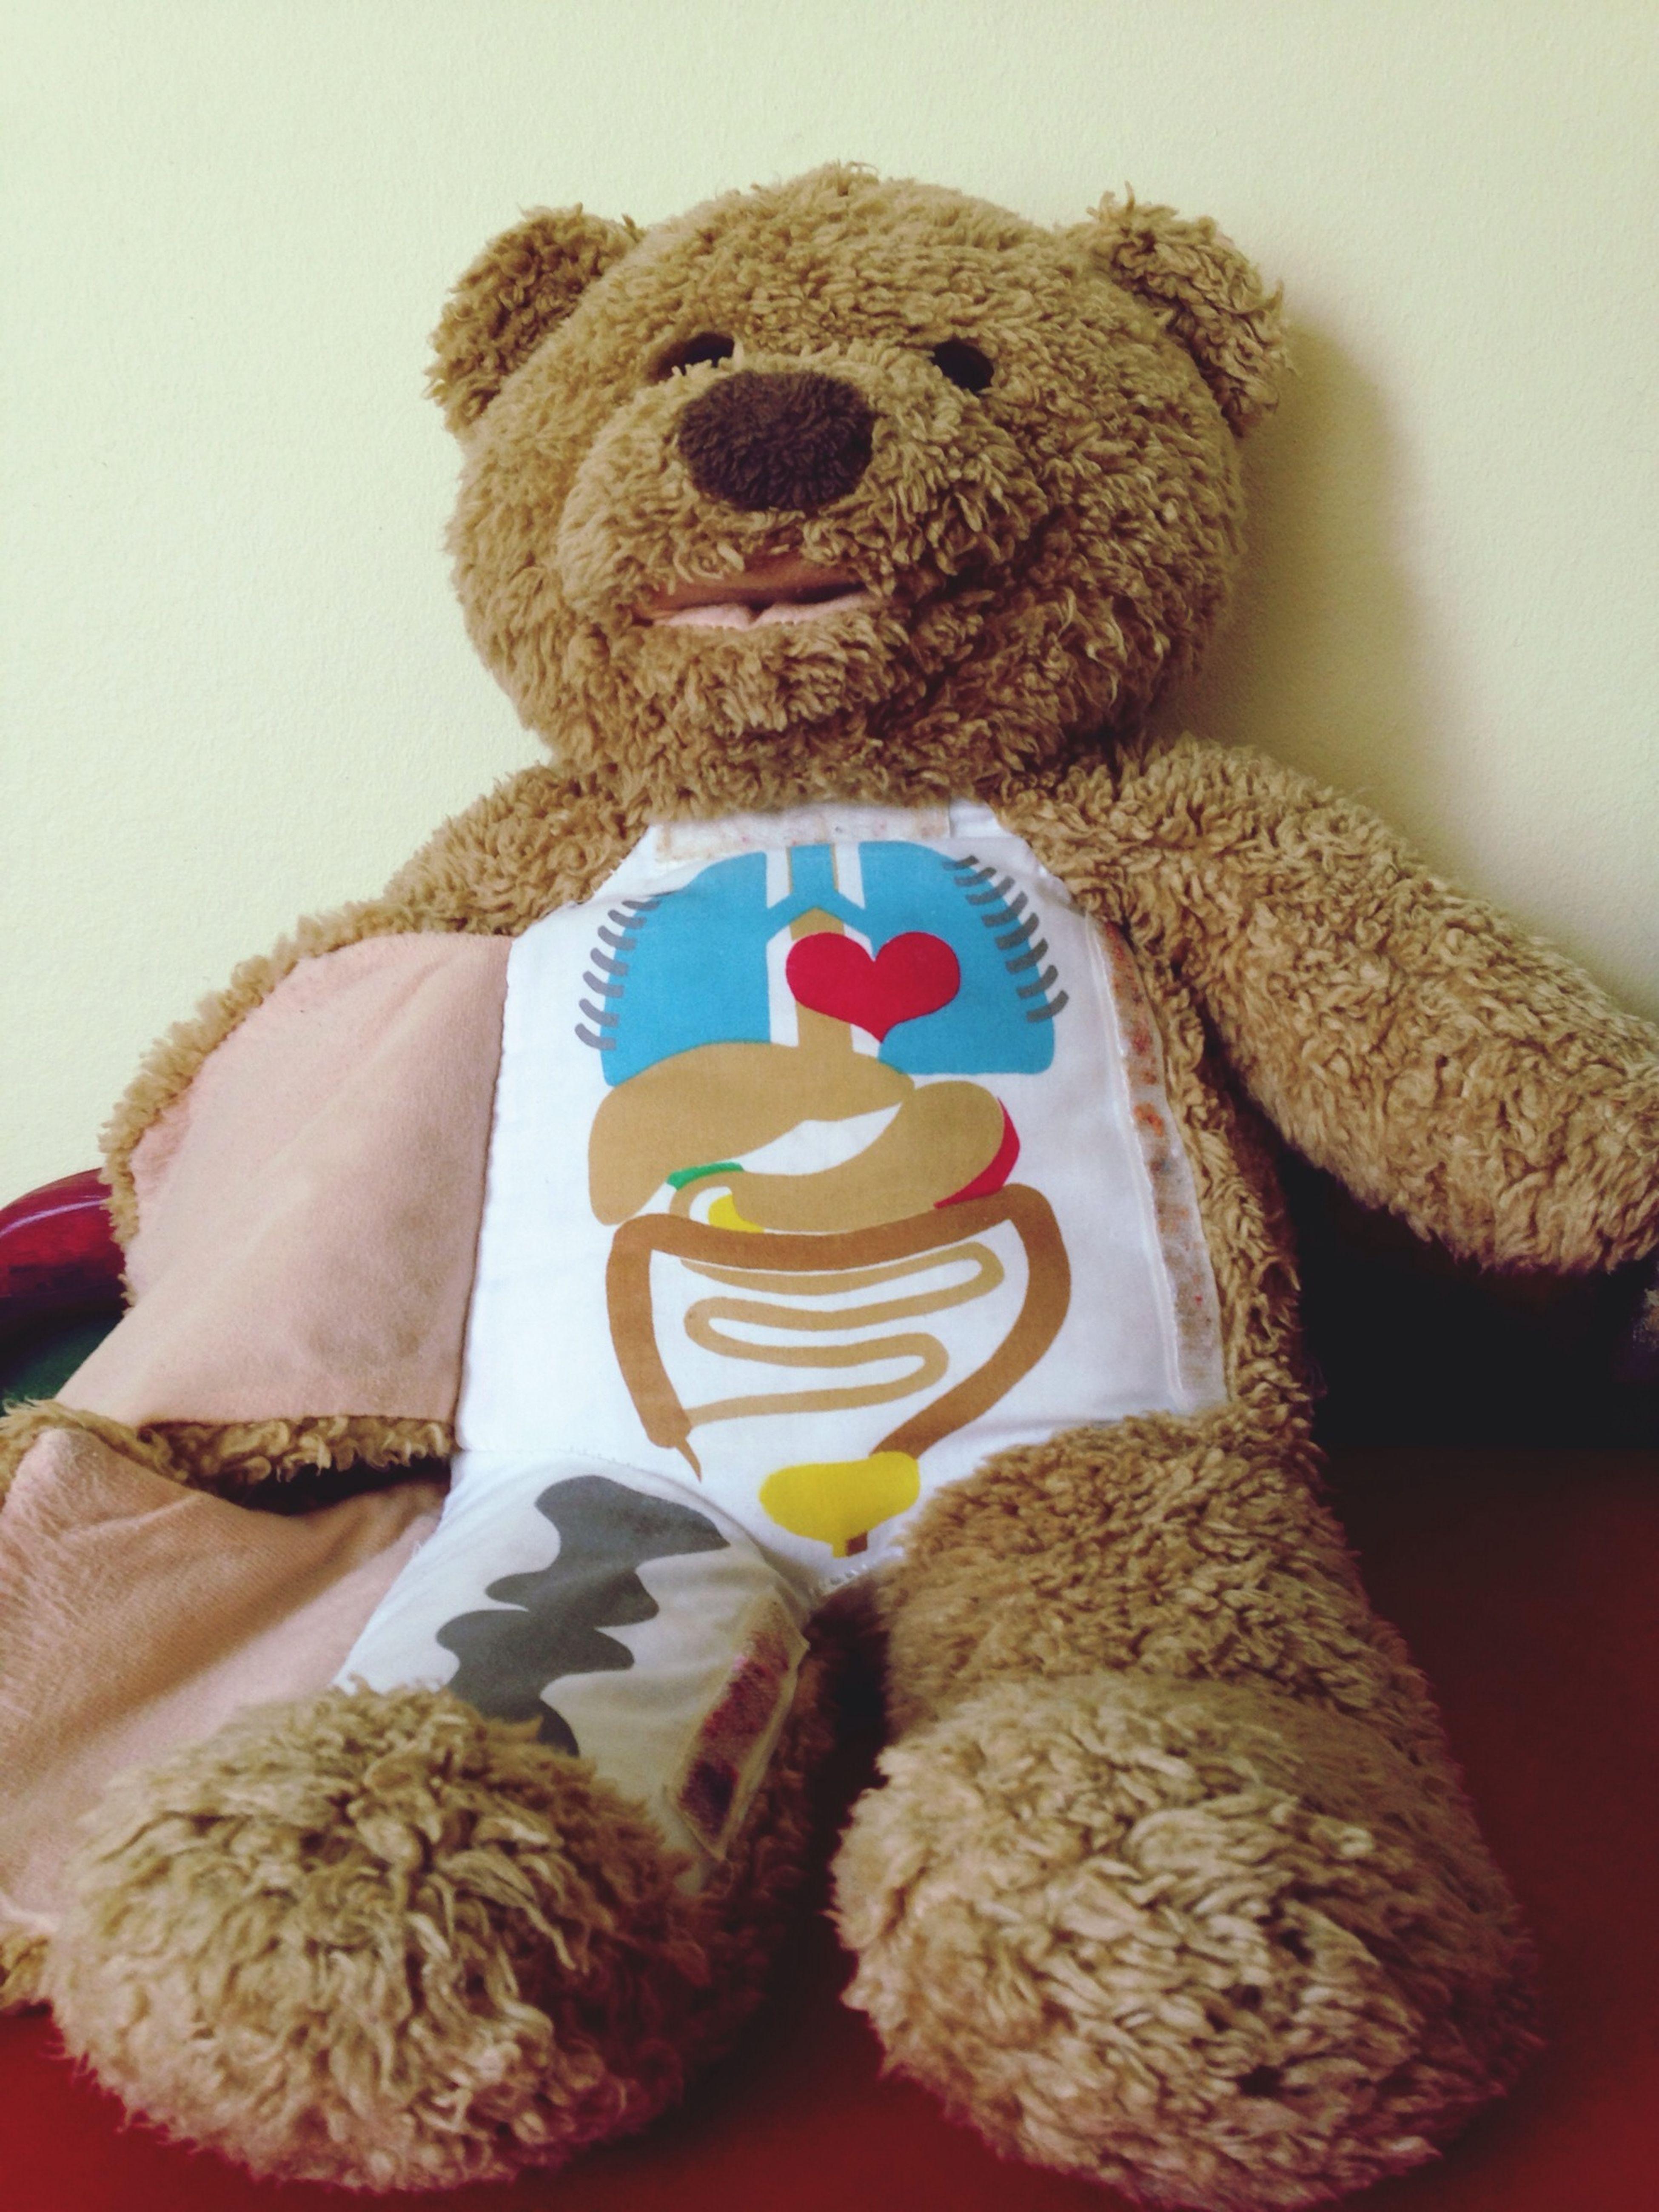 Heartattack Teddy Bear